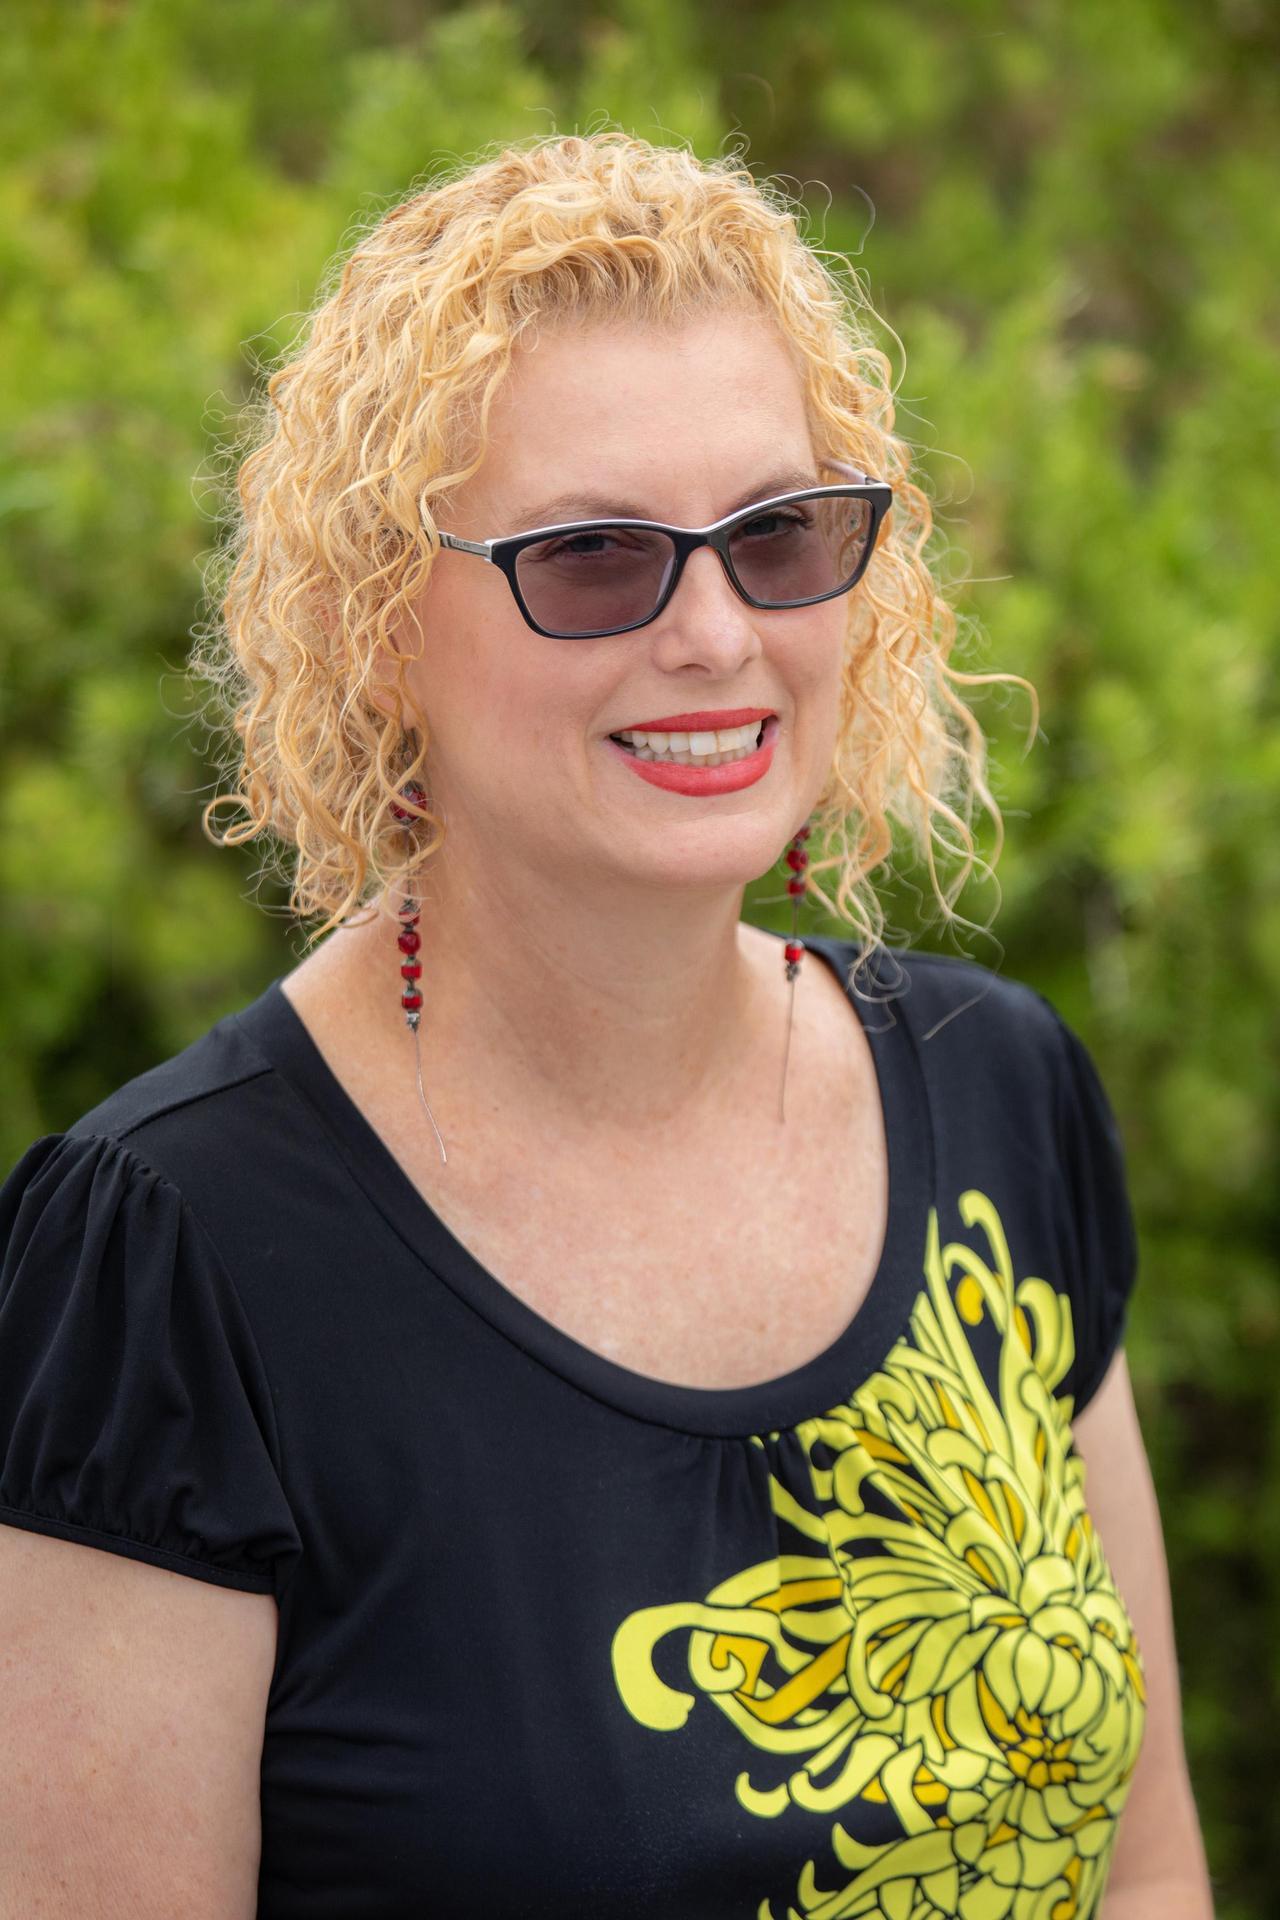 Ornit Levinson-Suter